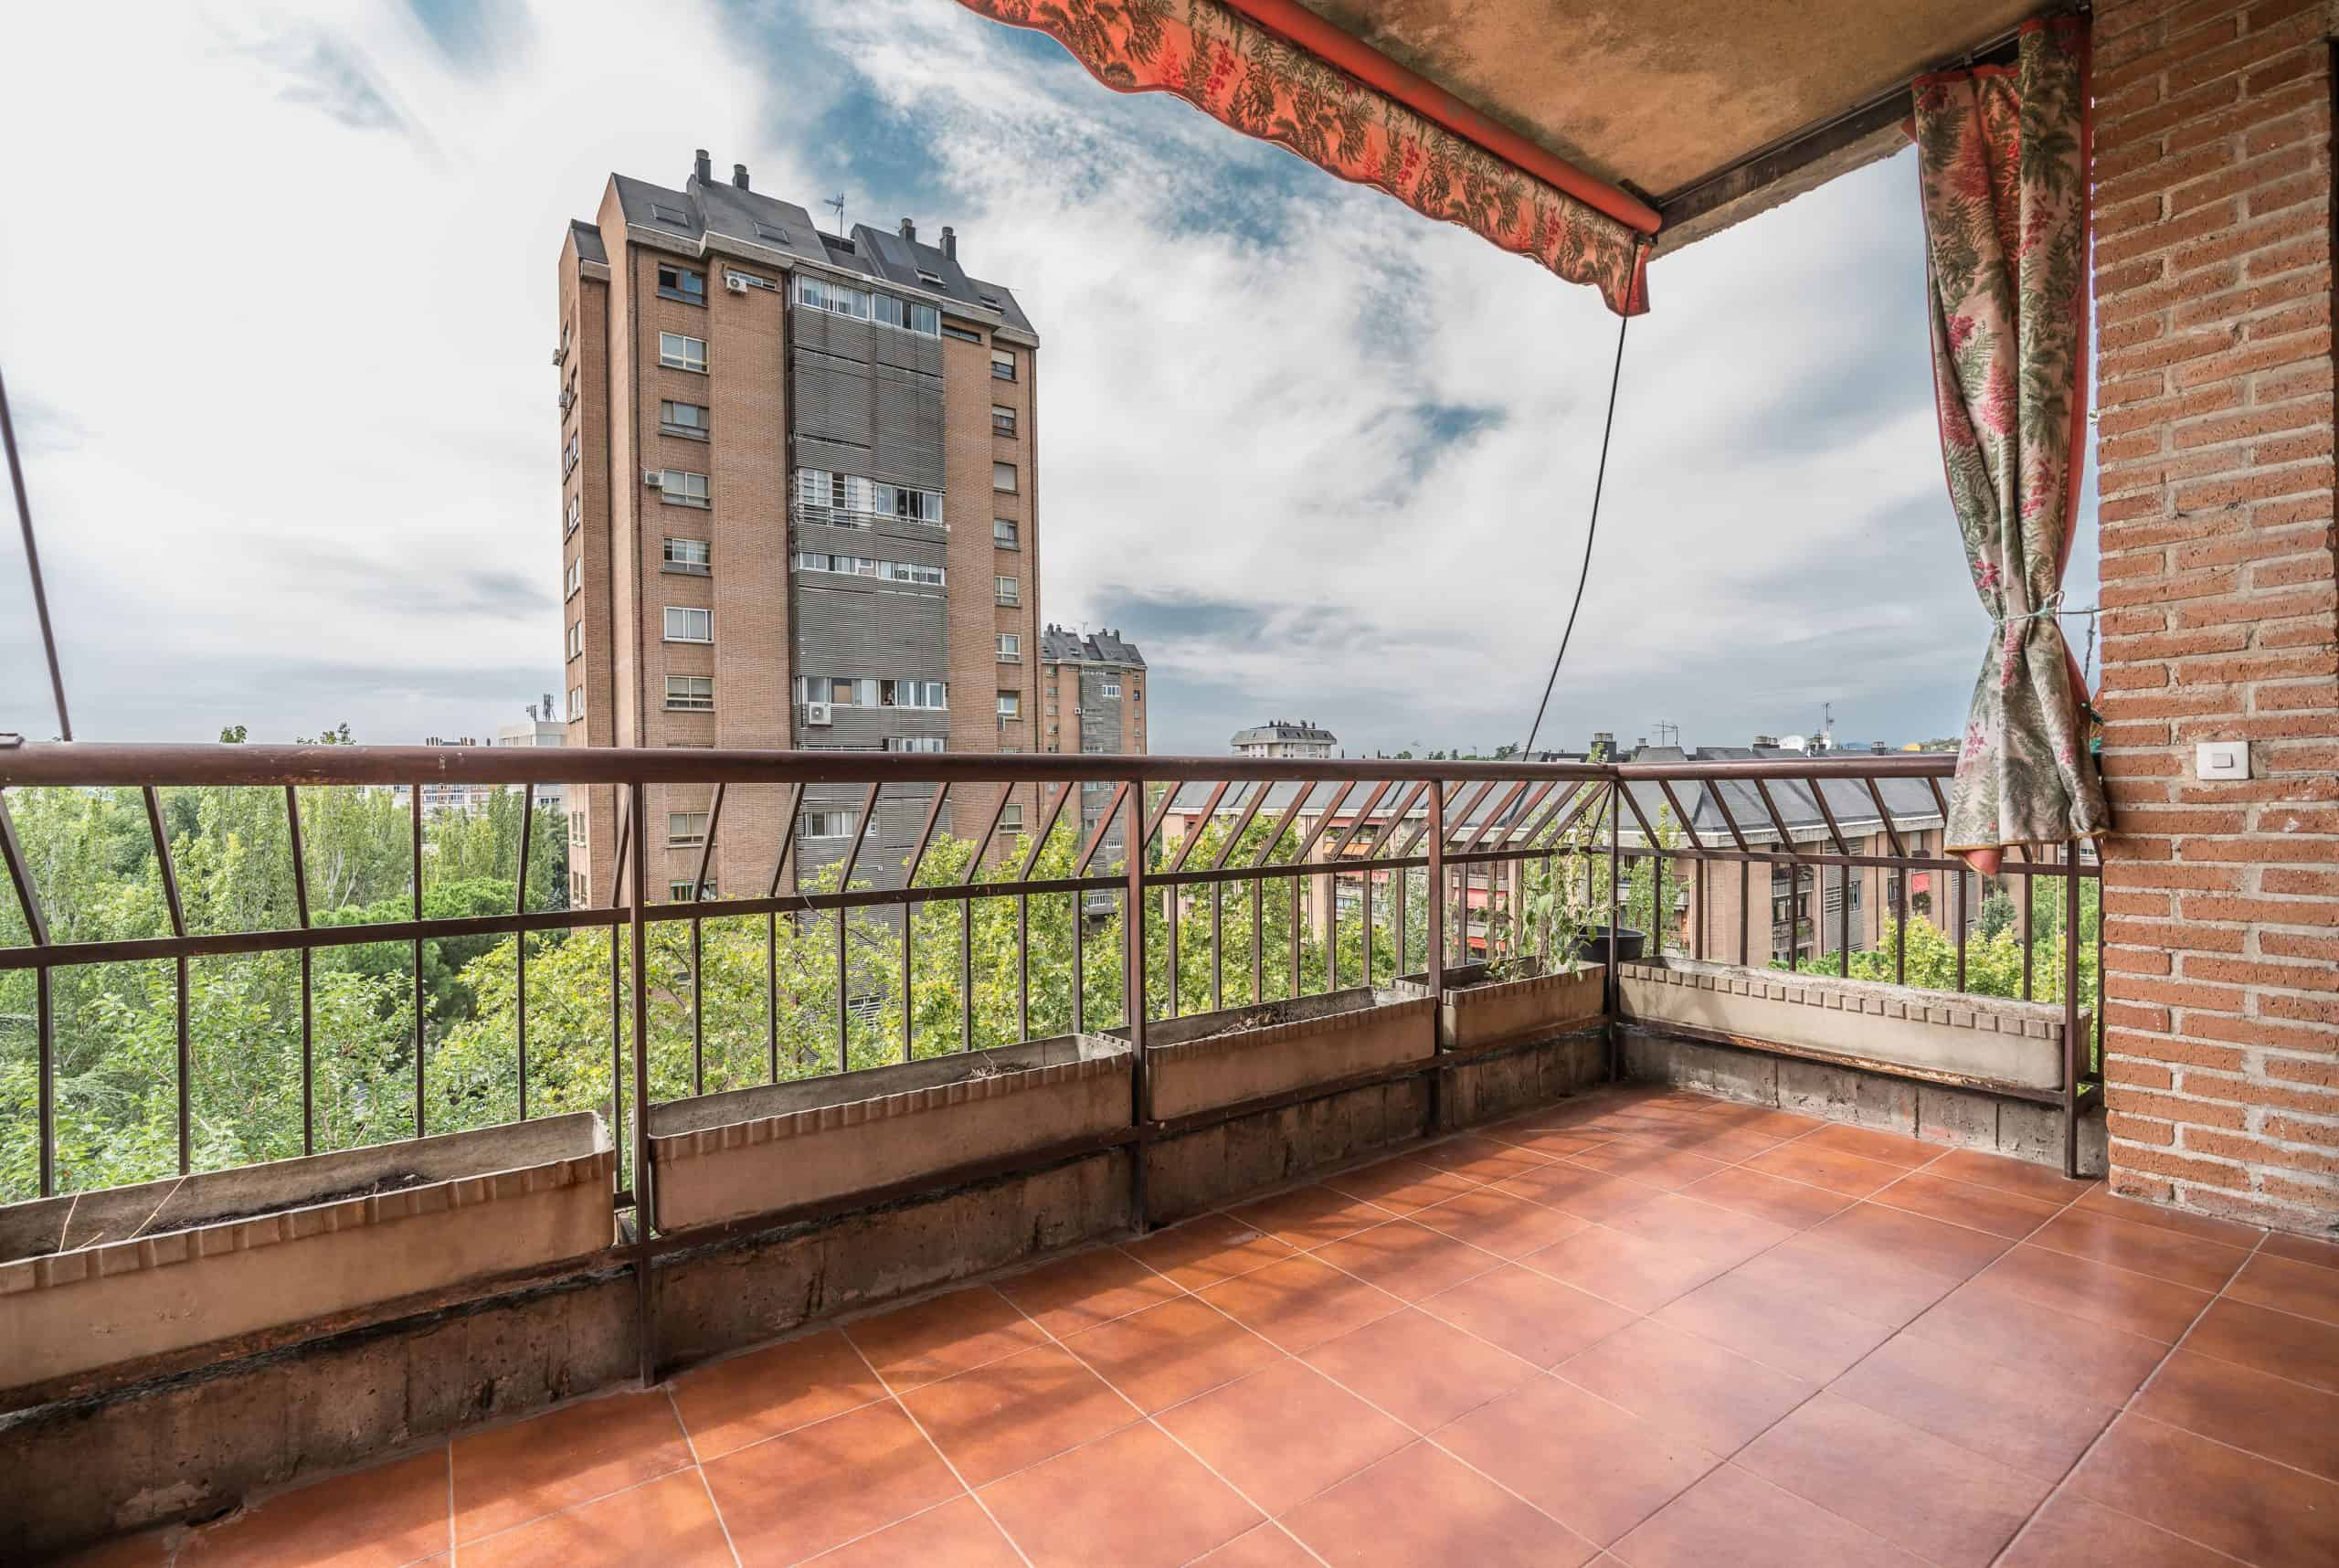 Agencia Inmobiliaria de Madrid-FUTUROCASA-Zona ARGANZUELA-EMBAJADORES-LEGAZPI -calle Embajadores- baño 11